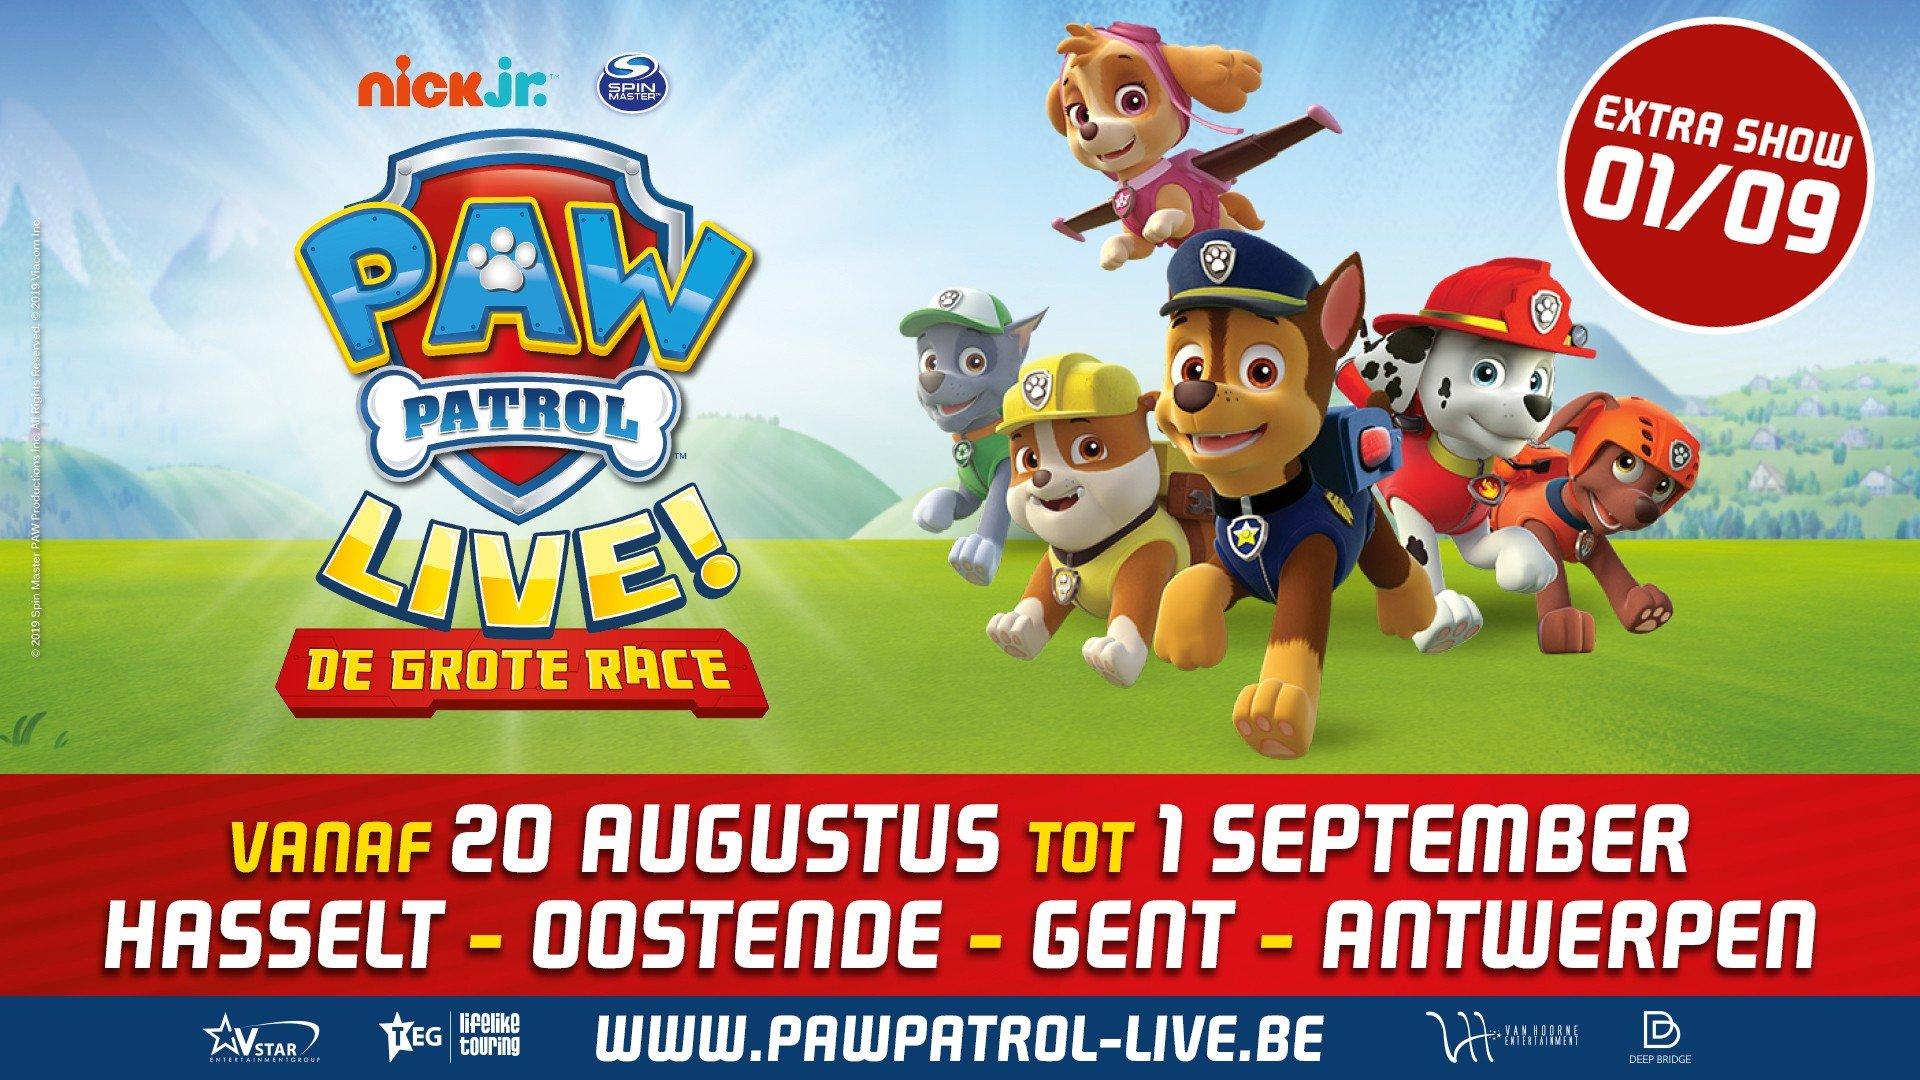 Extra theatervoorstellingen voor populaire Nick Jr.-serie PAW Patrol Live! - affiche Paw Patrol